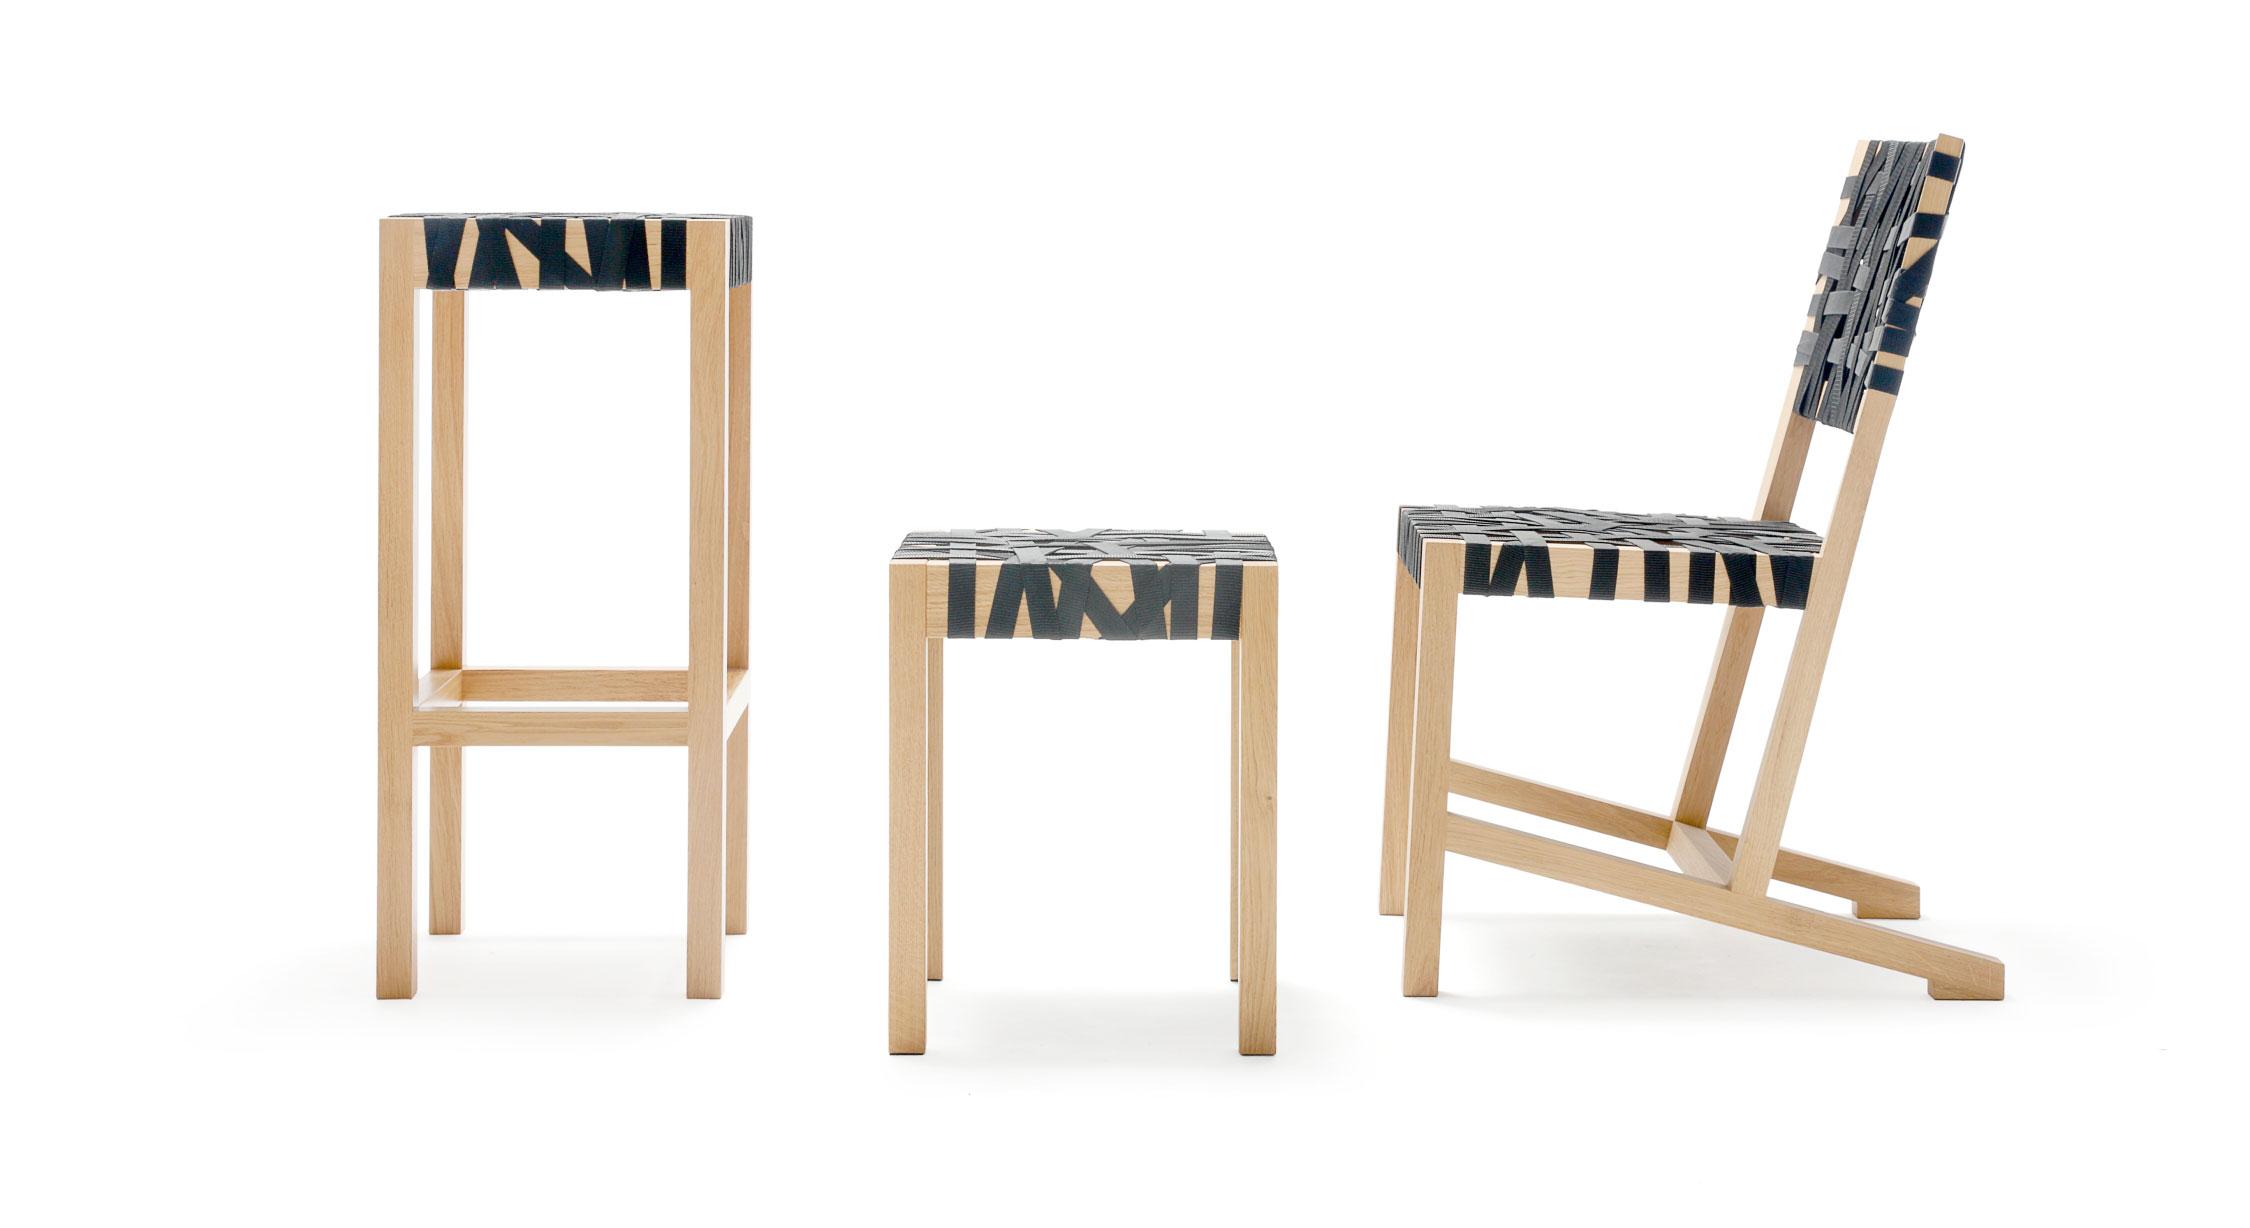 Barkruk Keuken Ikea : Gispen Berlage stoel, kruk en barkruk van Richard Hutten